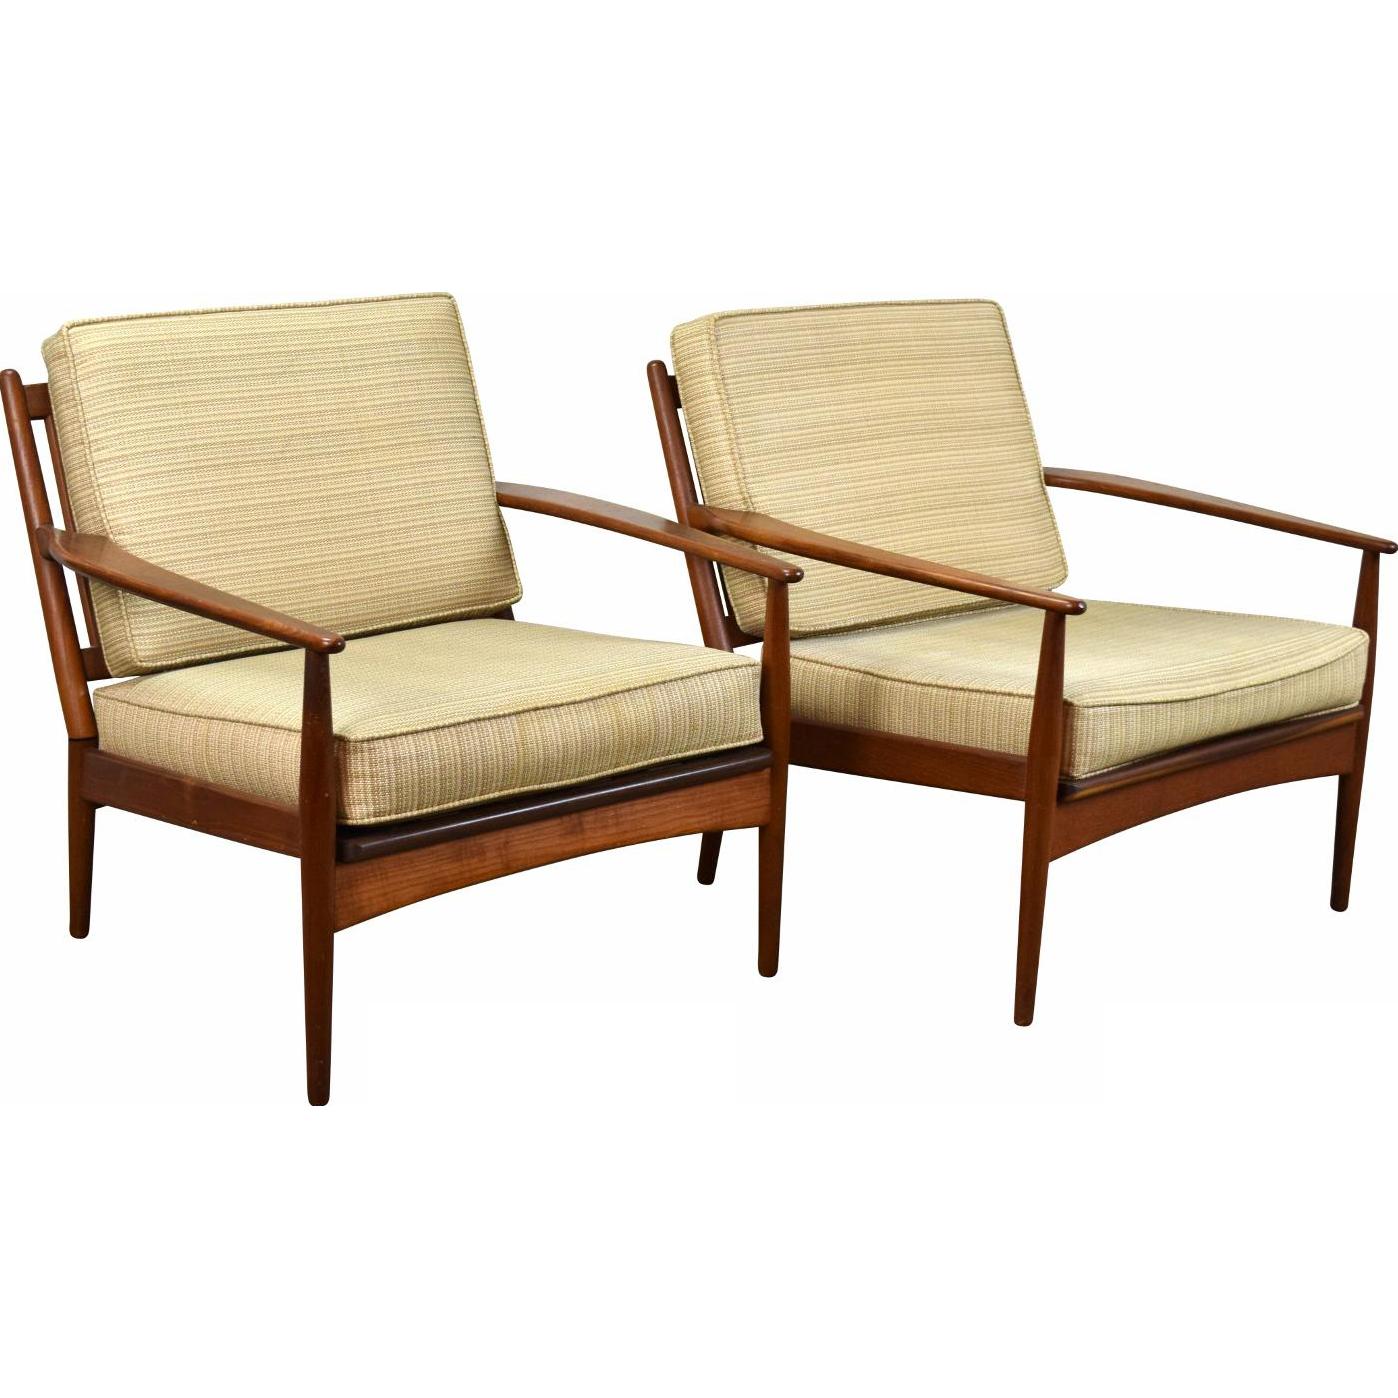 Pair Vintage Danish Modern Lounge Arm Chairs Teak Contoured Lines